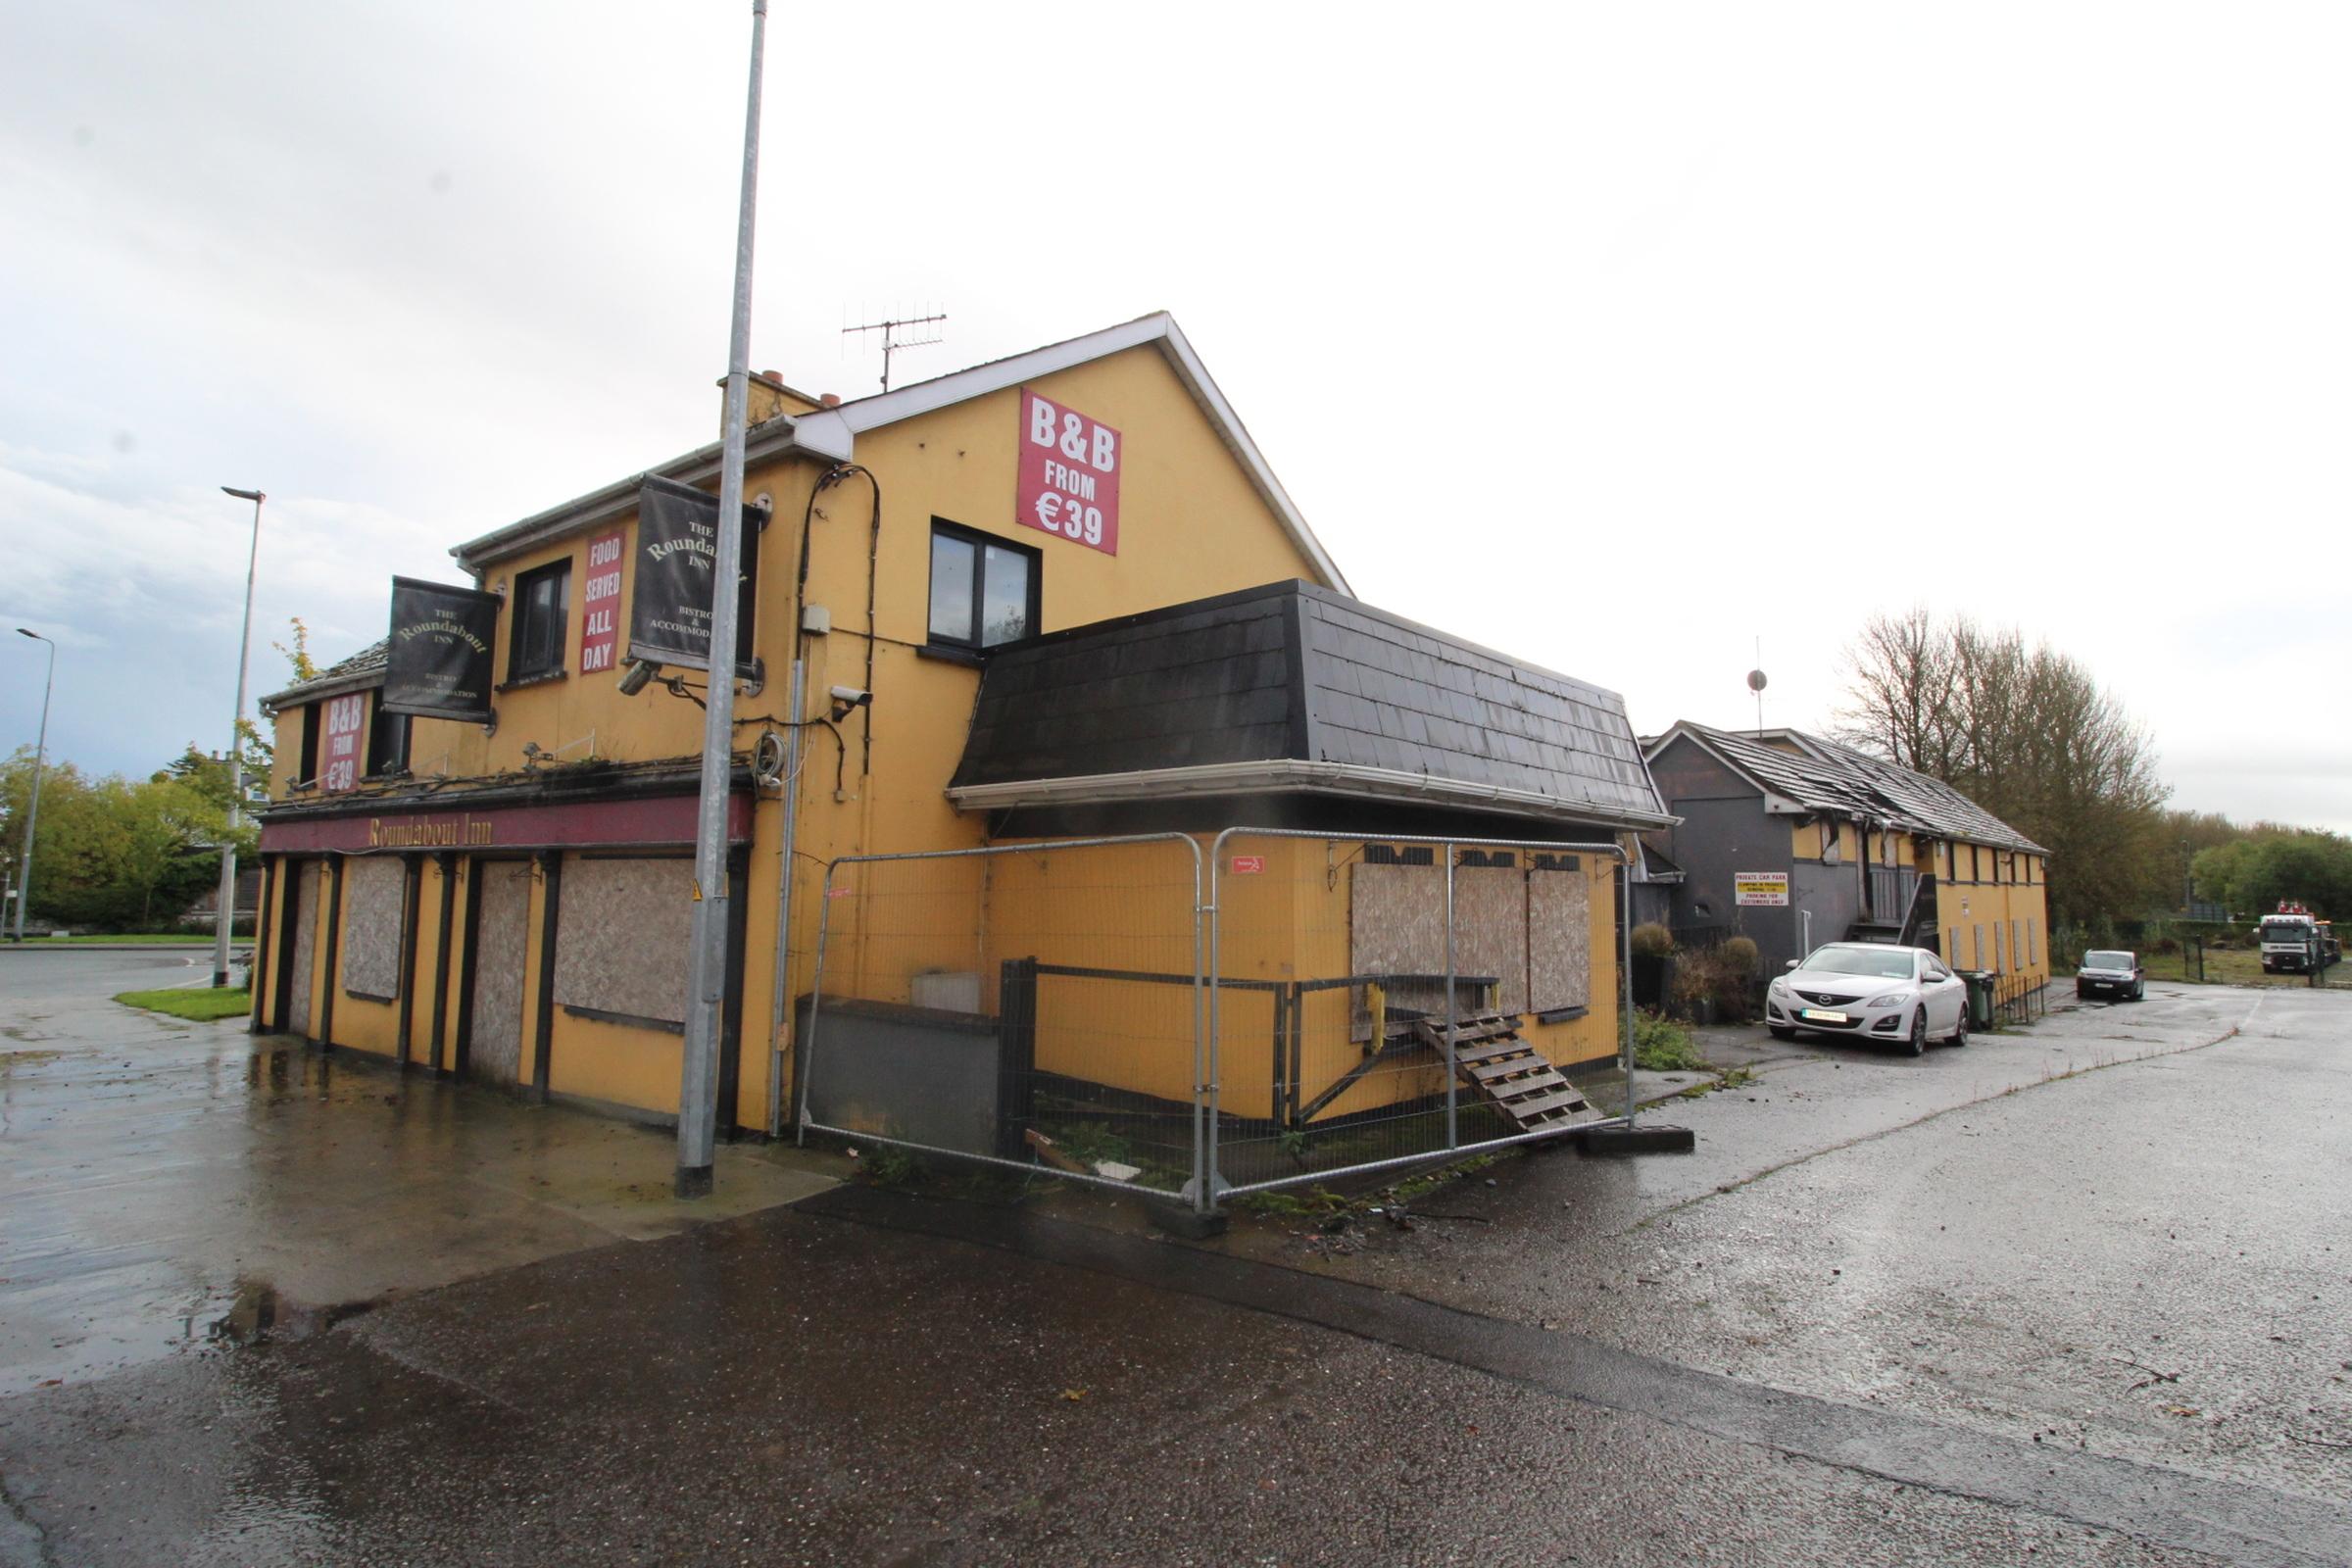 The Roundabout Inn, Mallow, Co. Cork